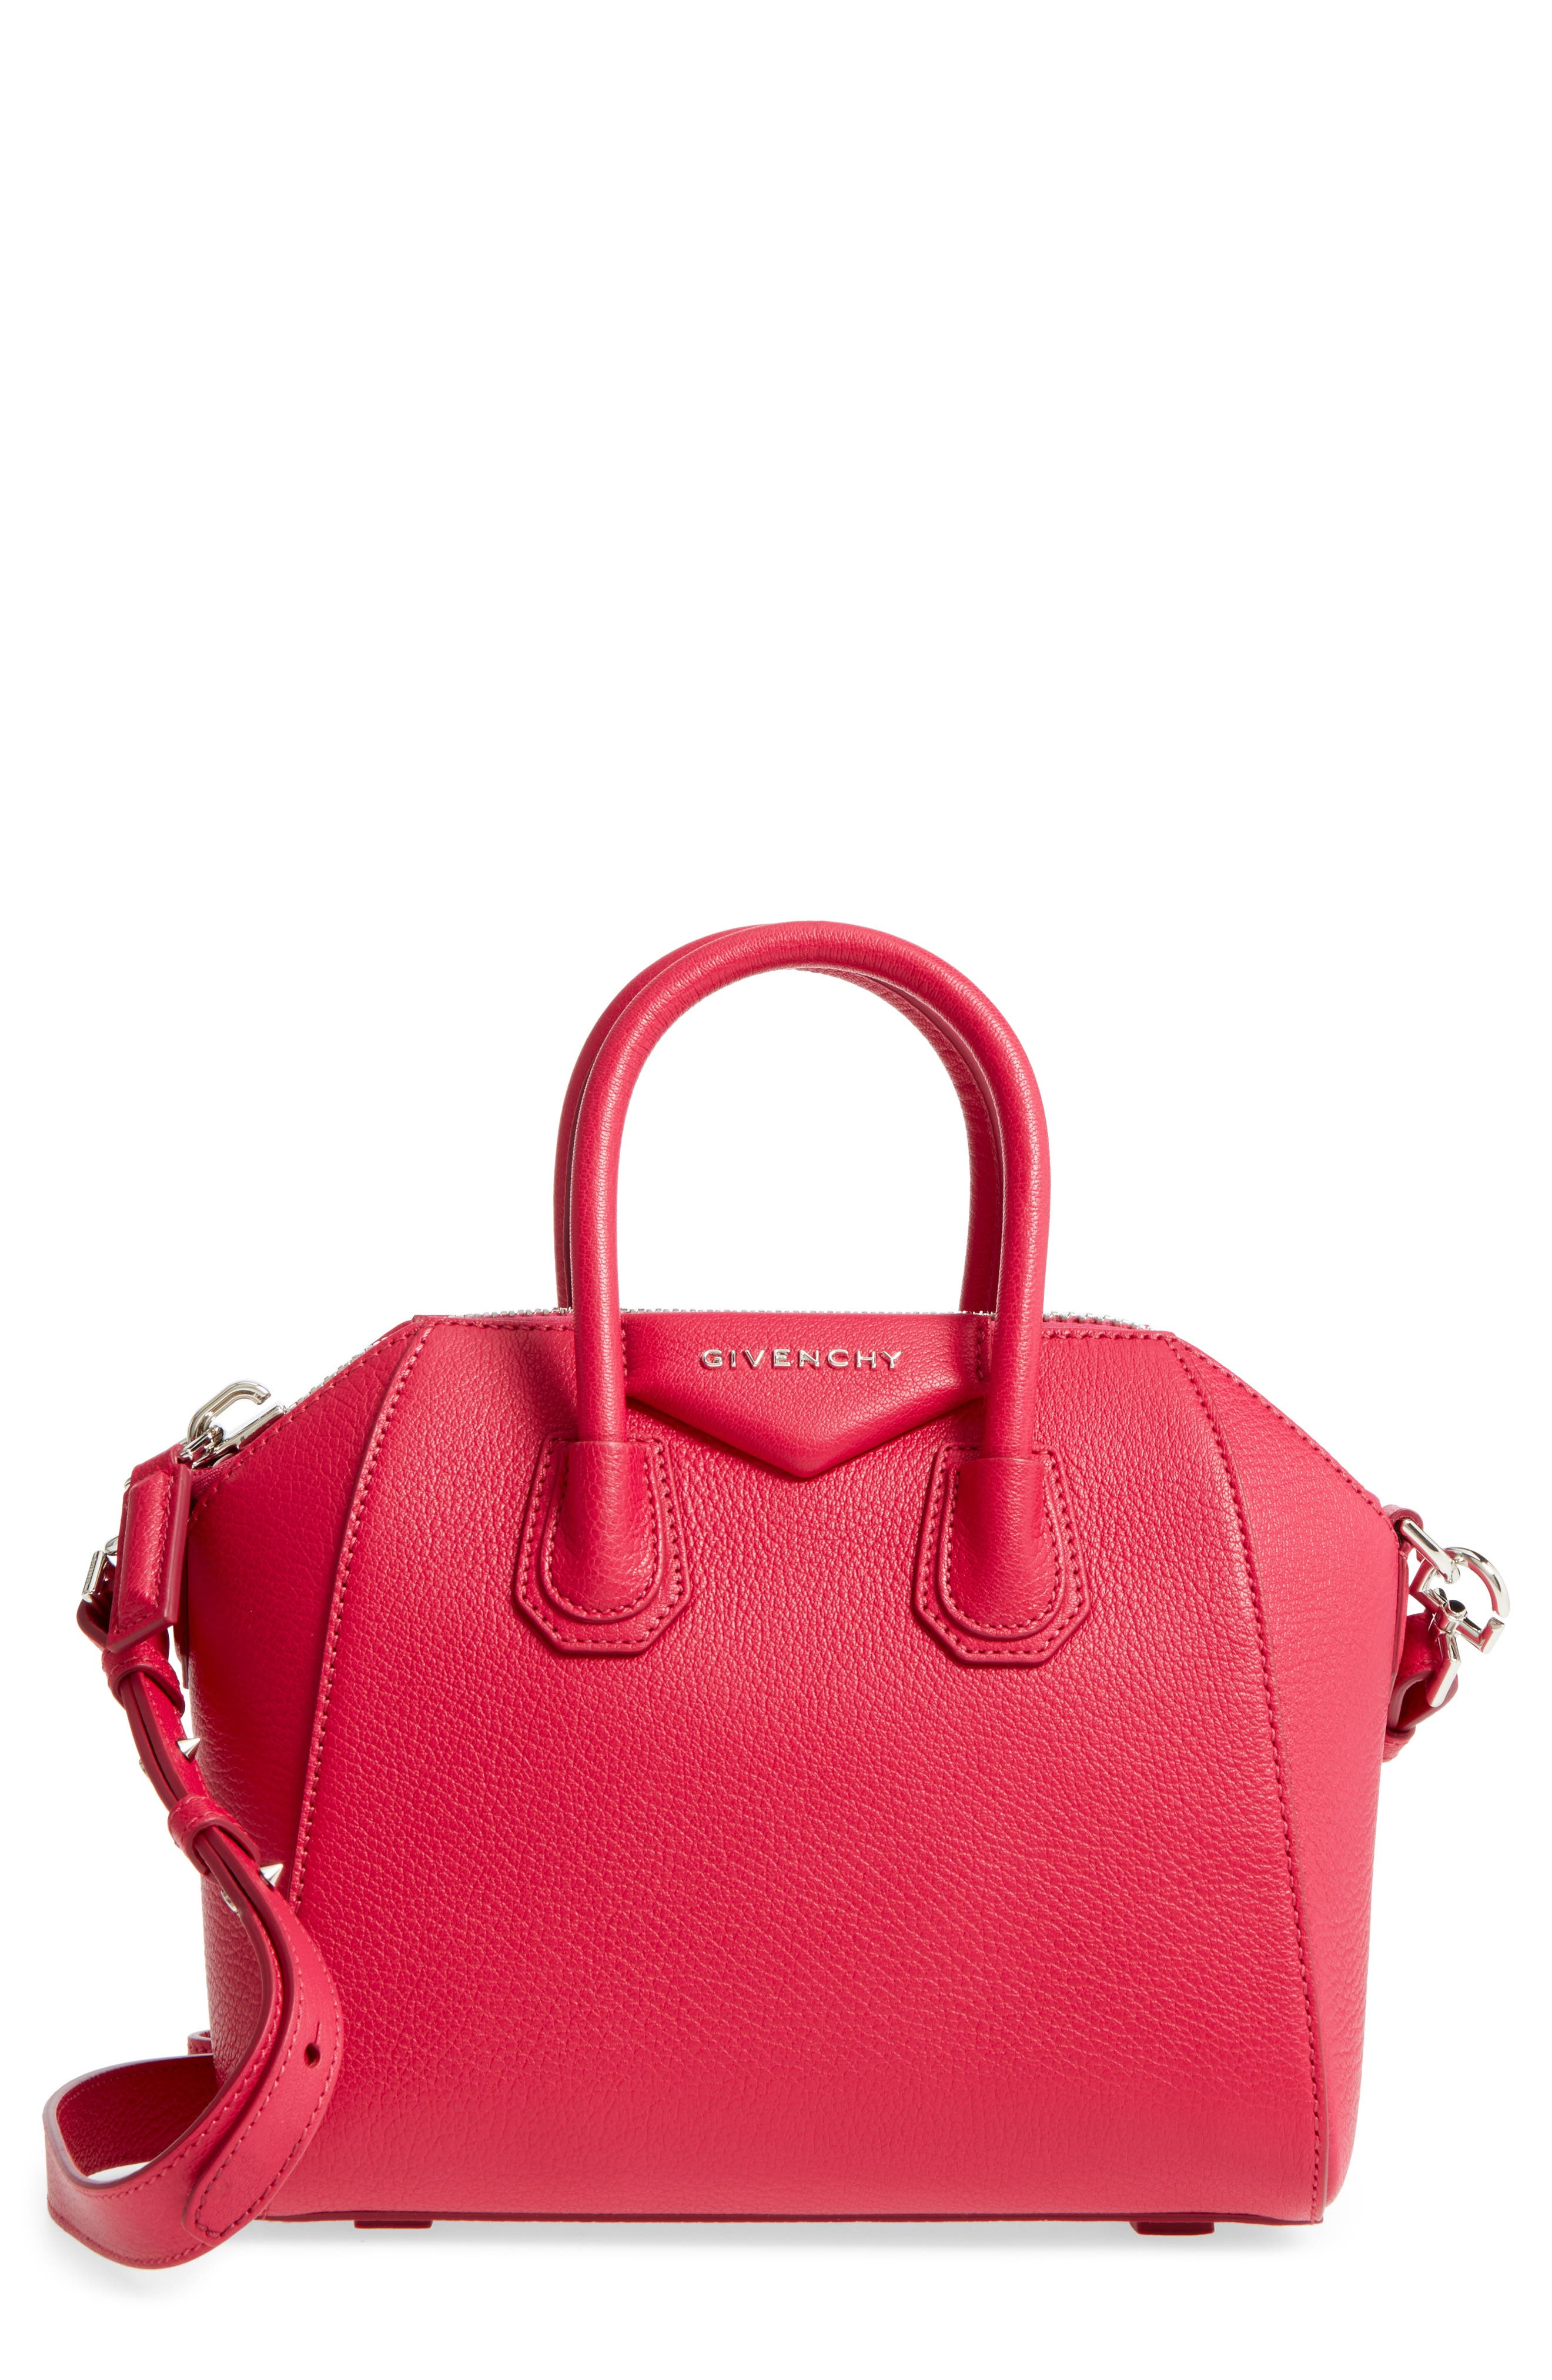 Givenchy 'Mini Antigona' Sugar Leather Satchel